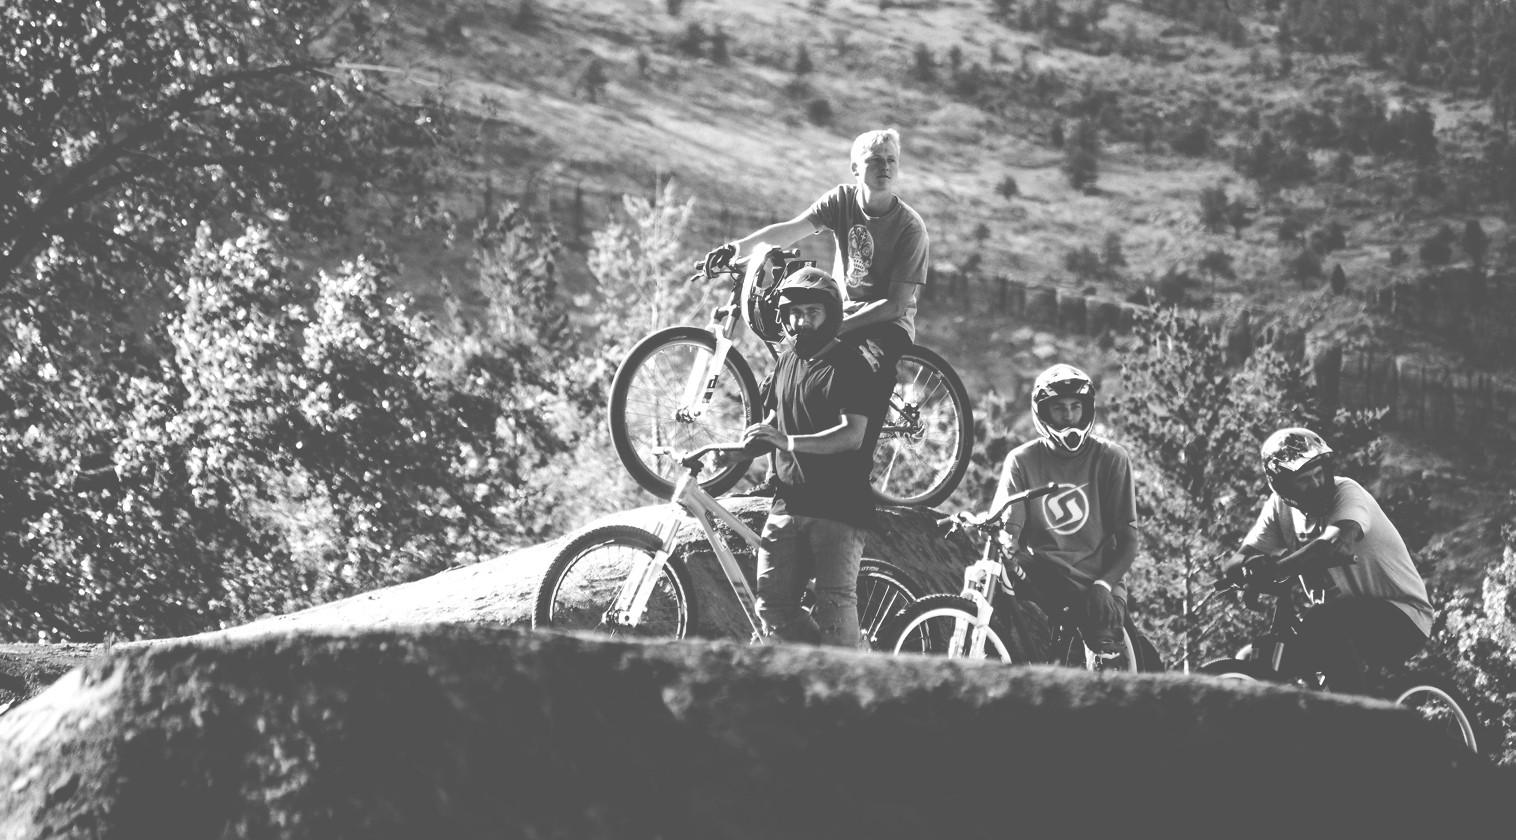 Outlaws of Dirt - rhiannon - Mountain Biking Pictures - Vital MTB